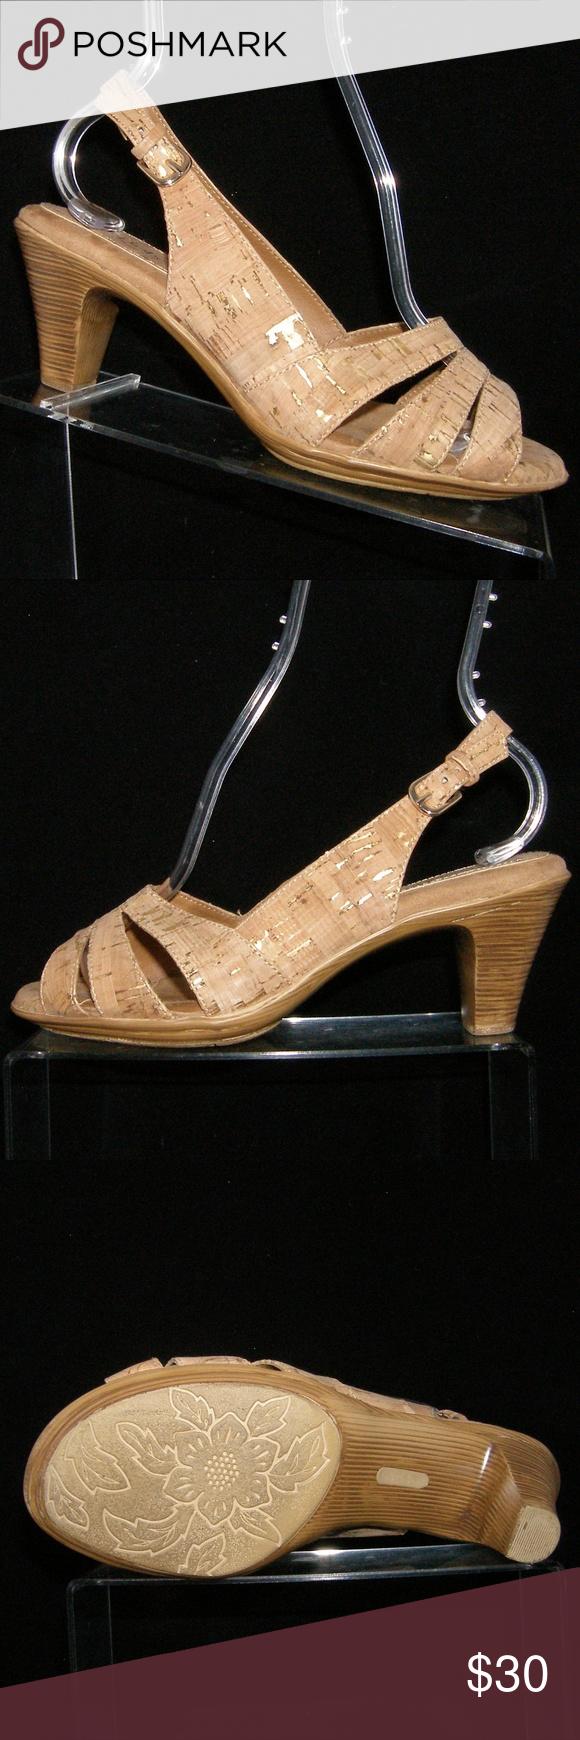 74edbd37769 Softspots Neima beige cork print slingbacks 8WW These Softspots shoes  features all man made materials